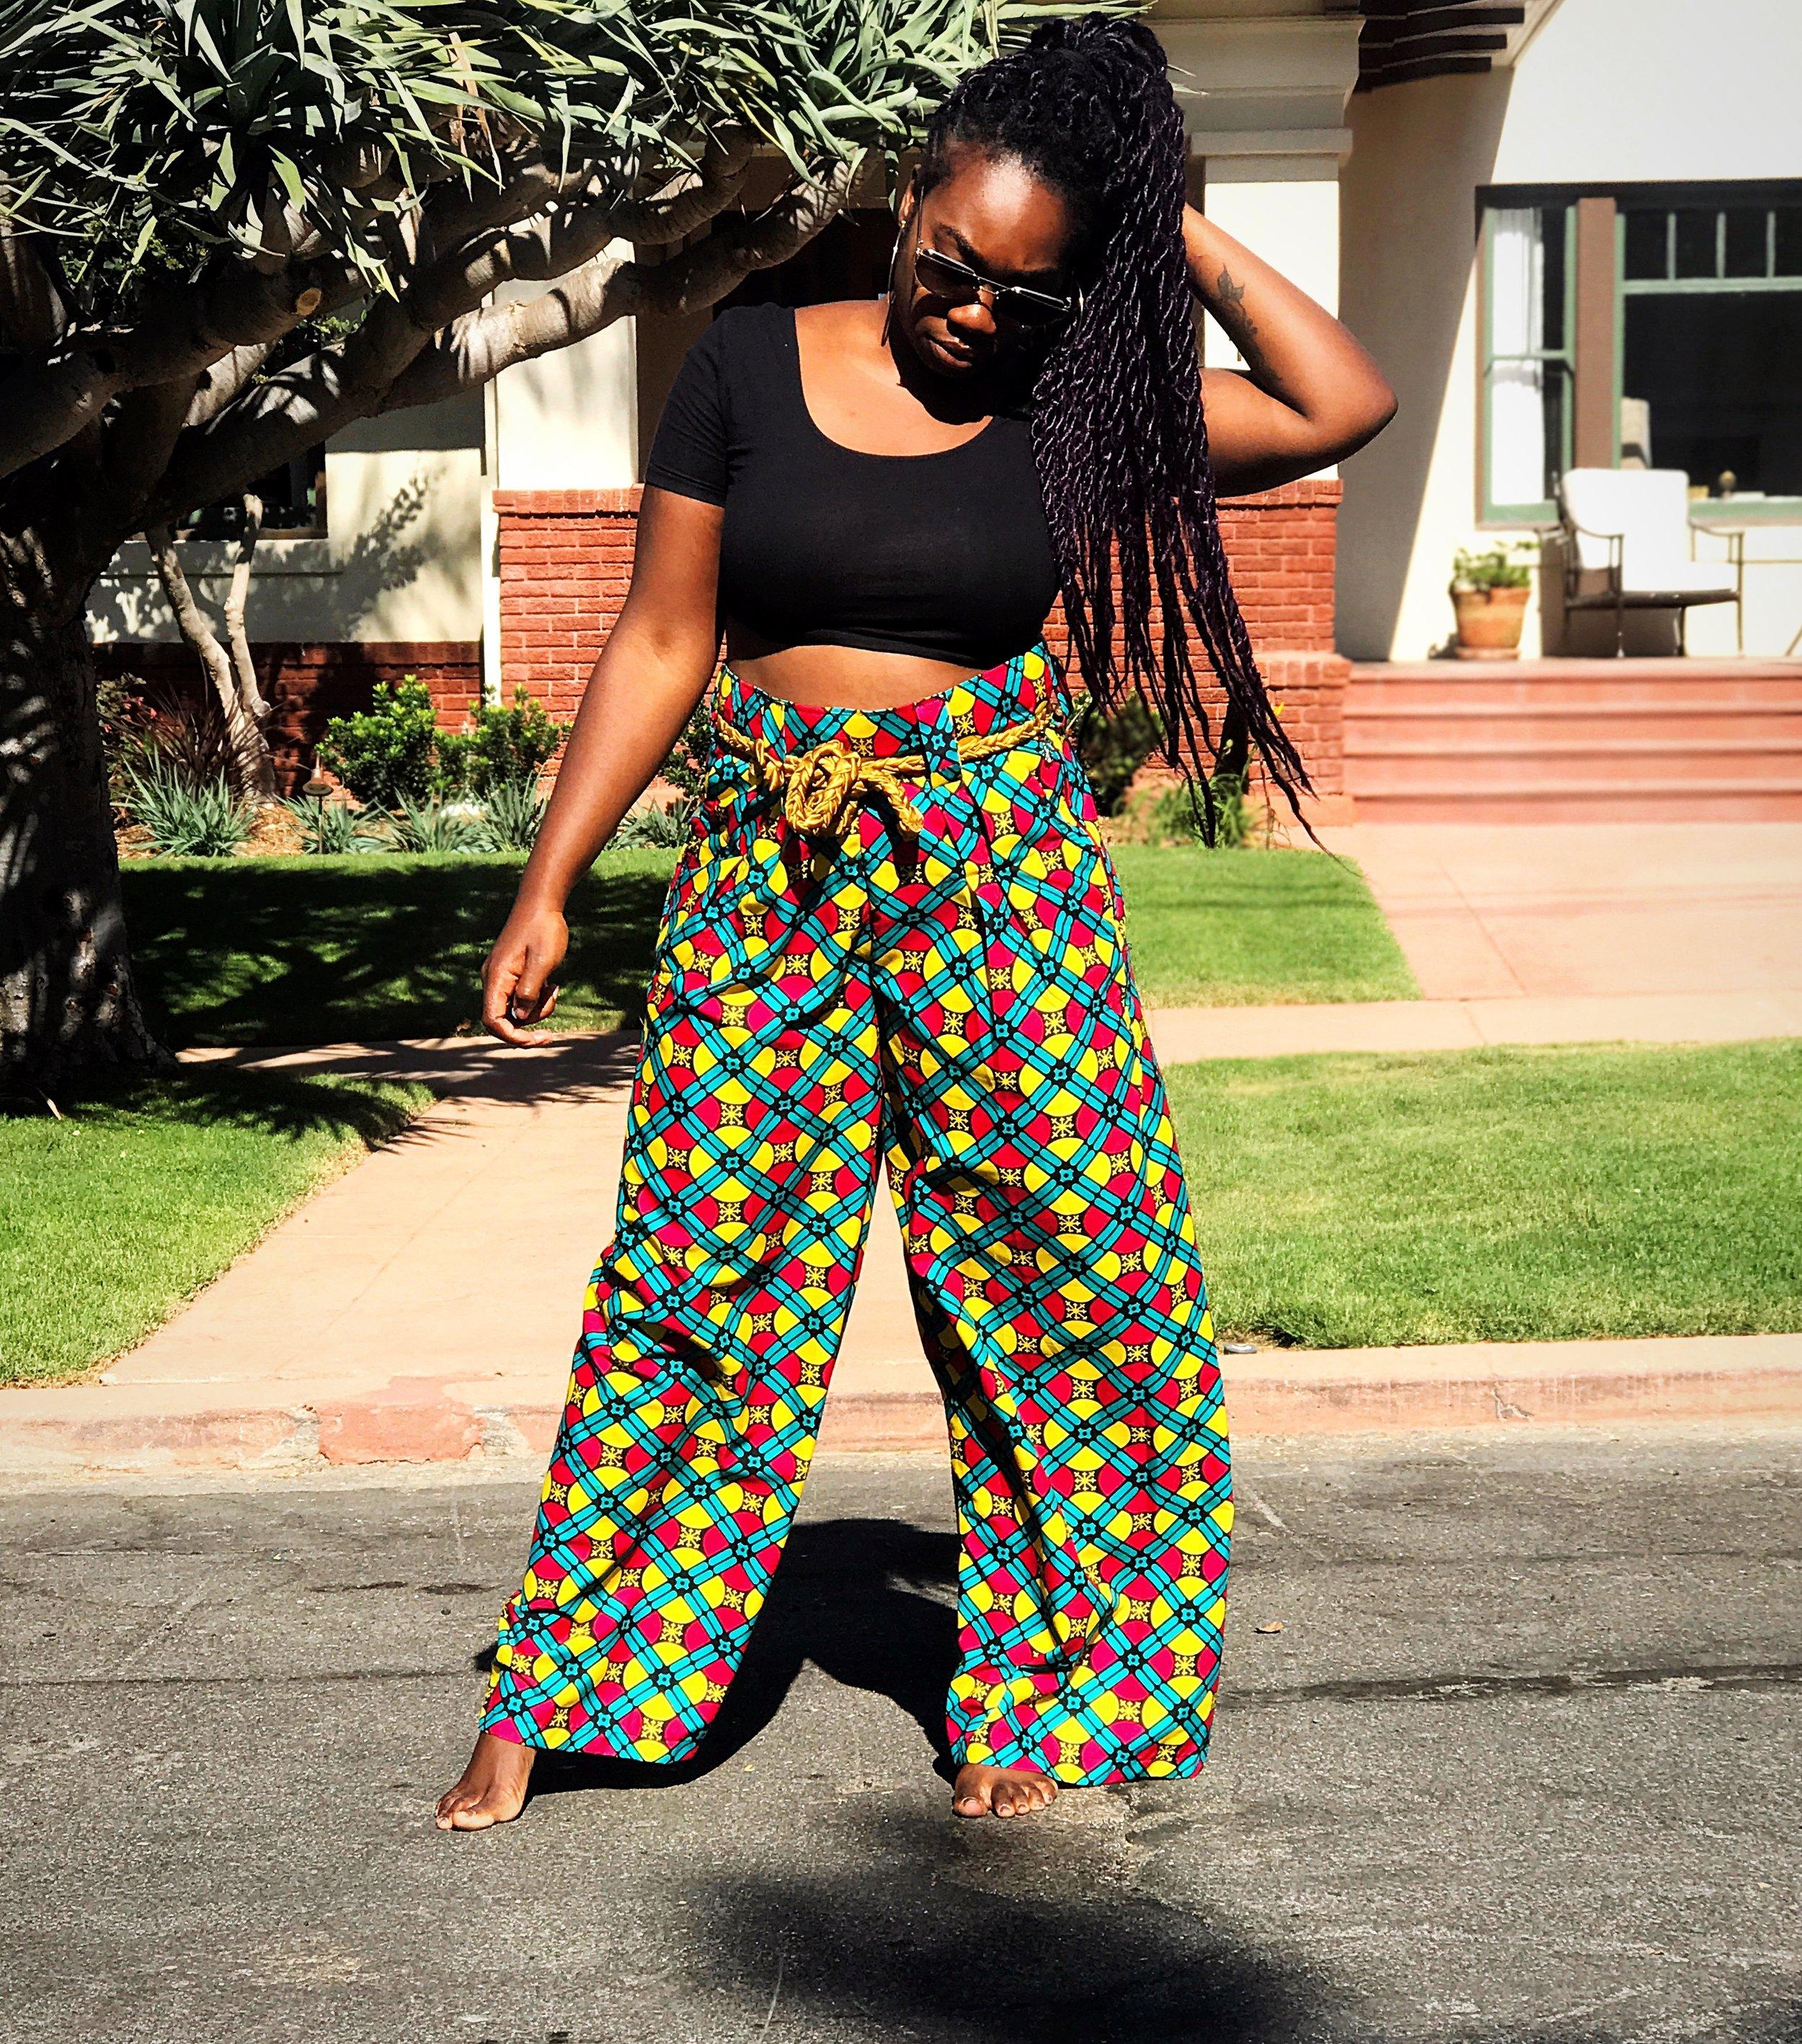 Femi wearing ankara print wide leg pants and black crop top standing in the street #BlackGirlMagic